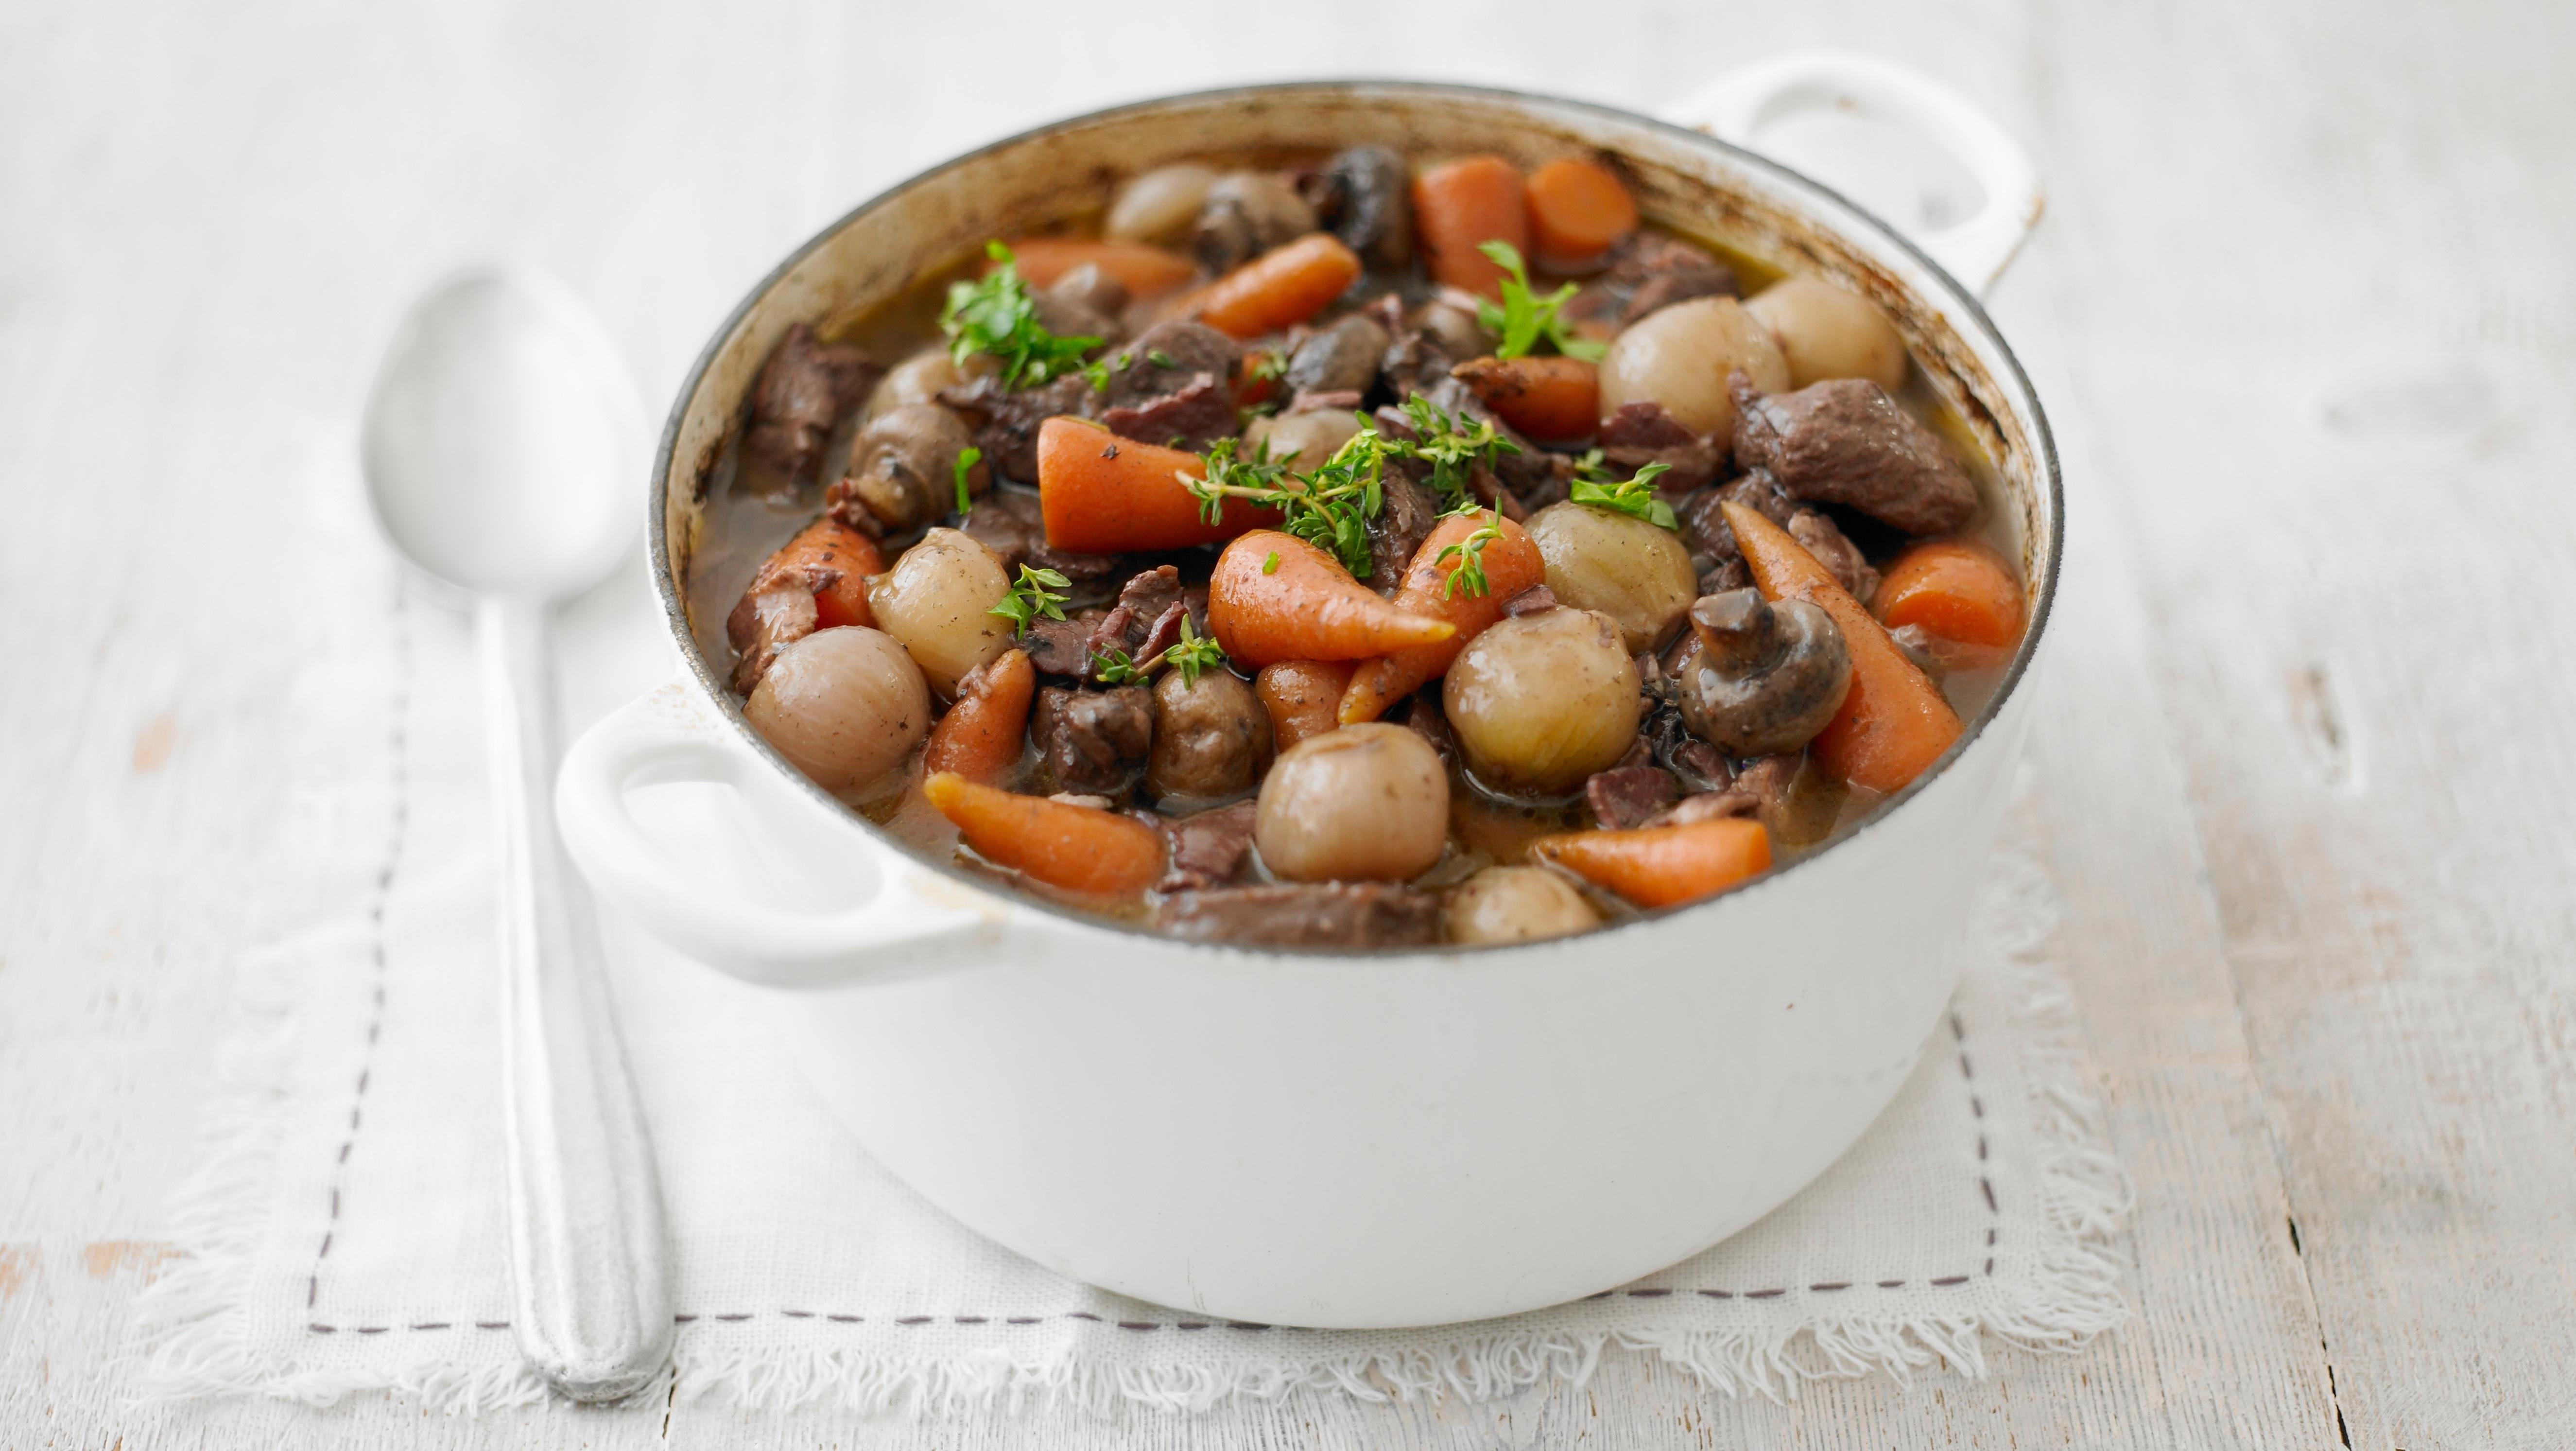 Betty crocker old fashioned beef stew 93